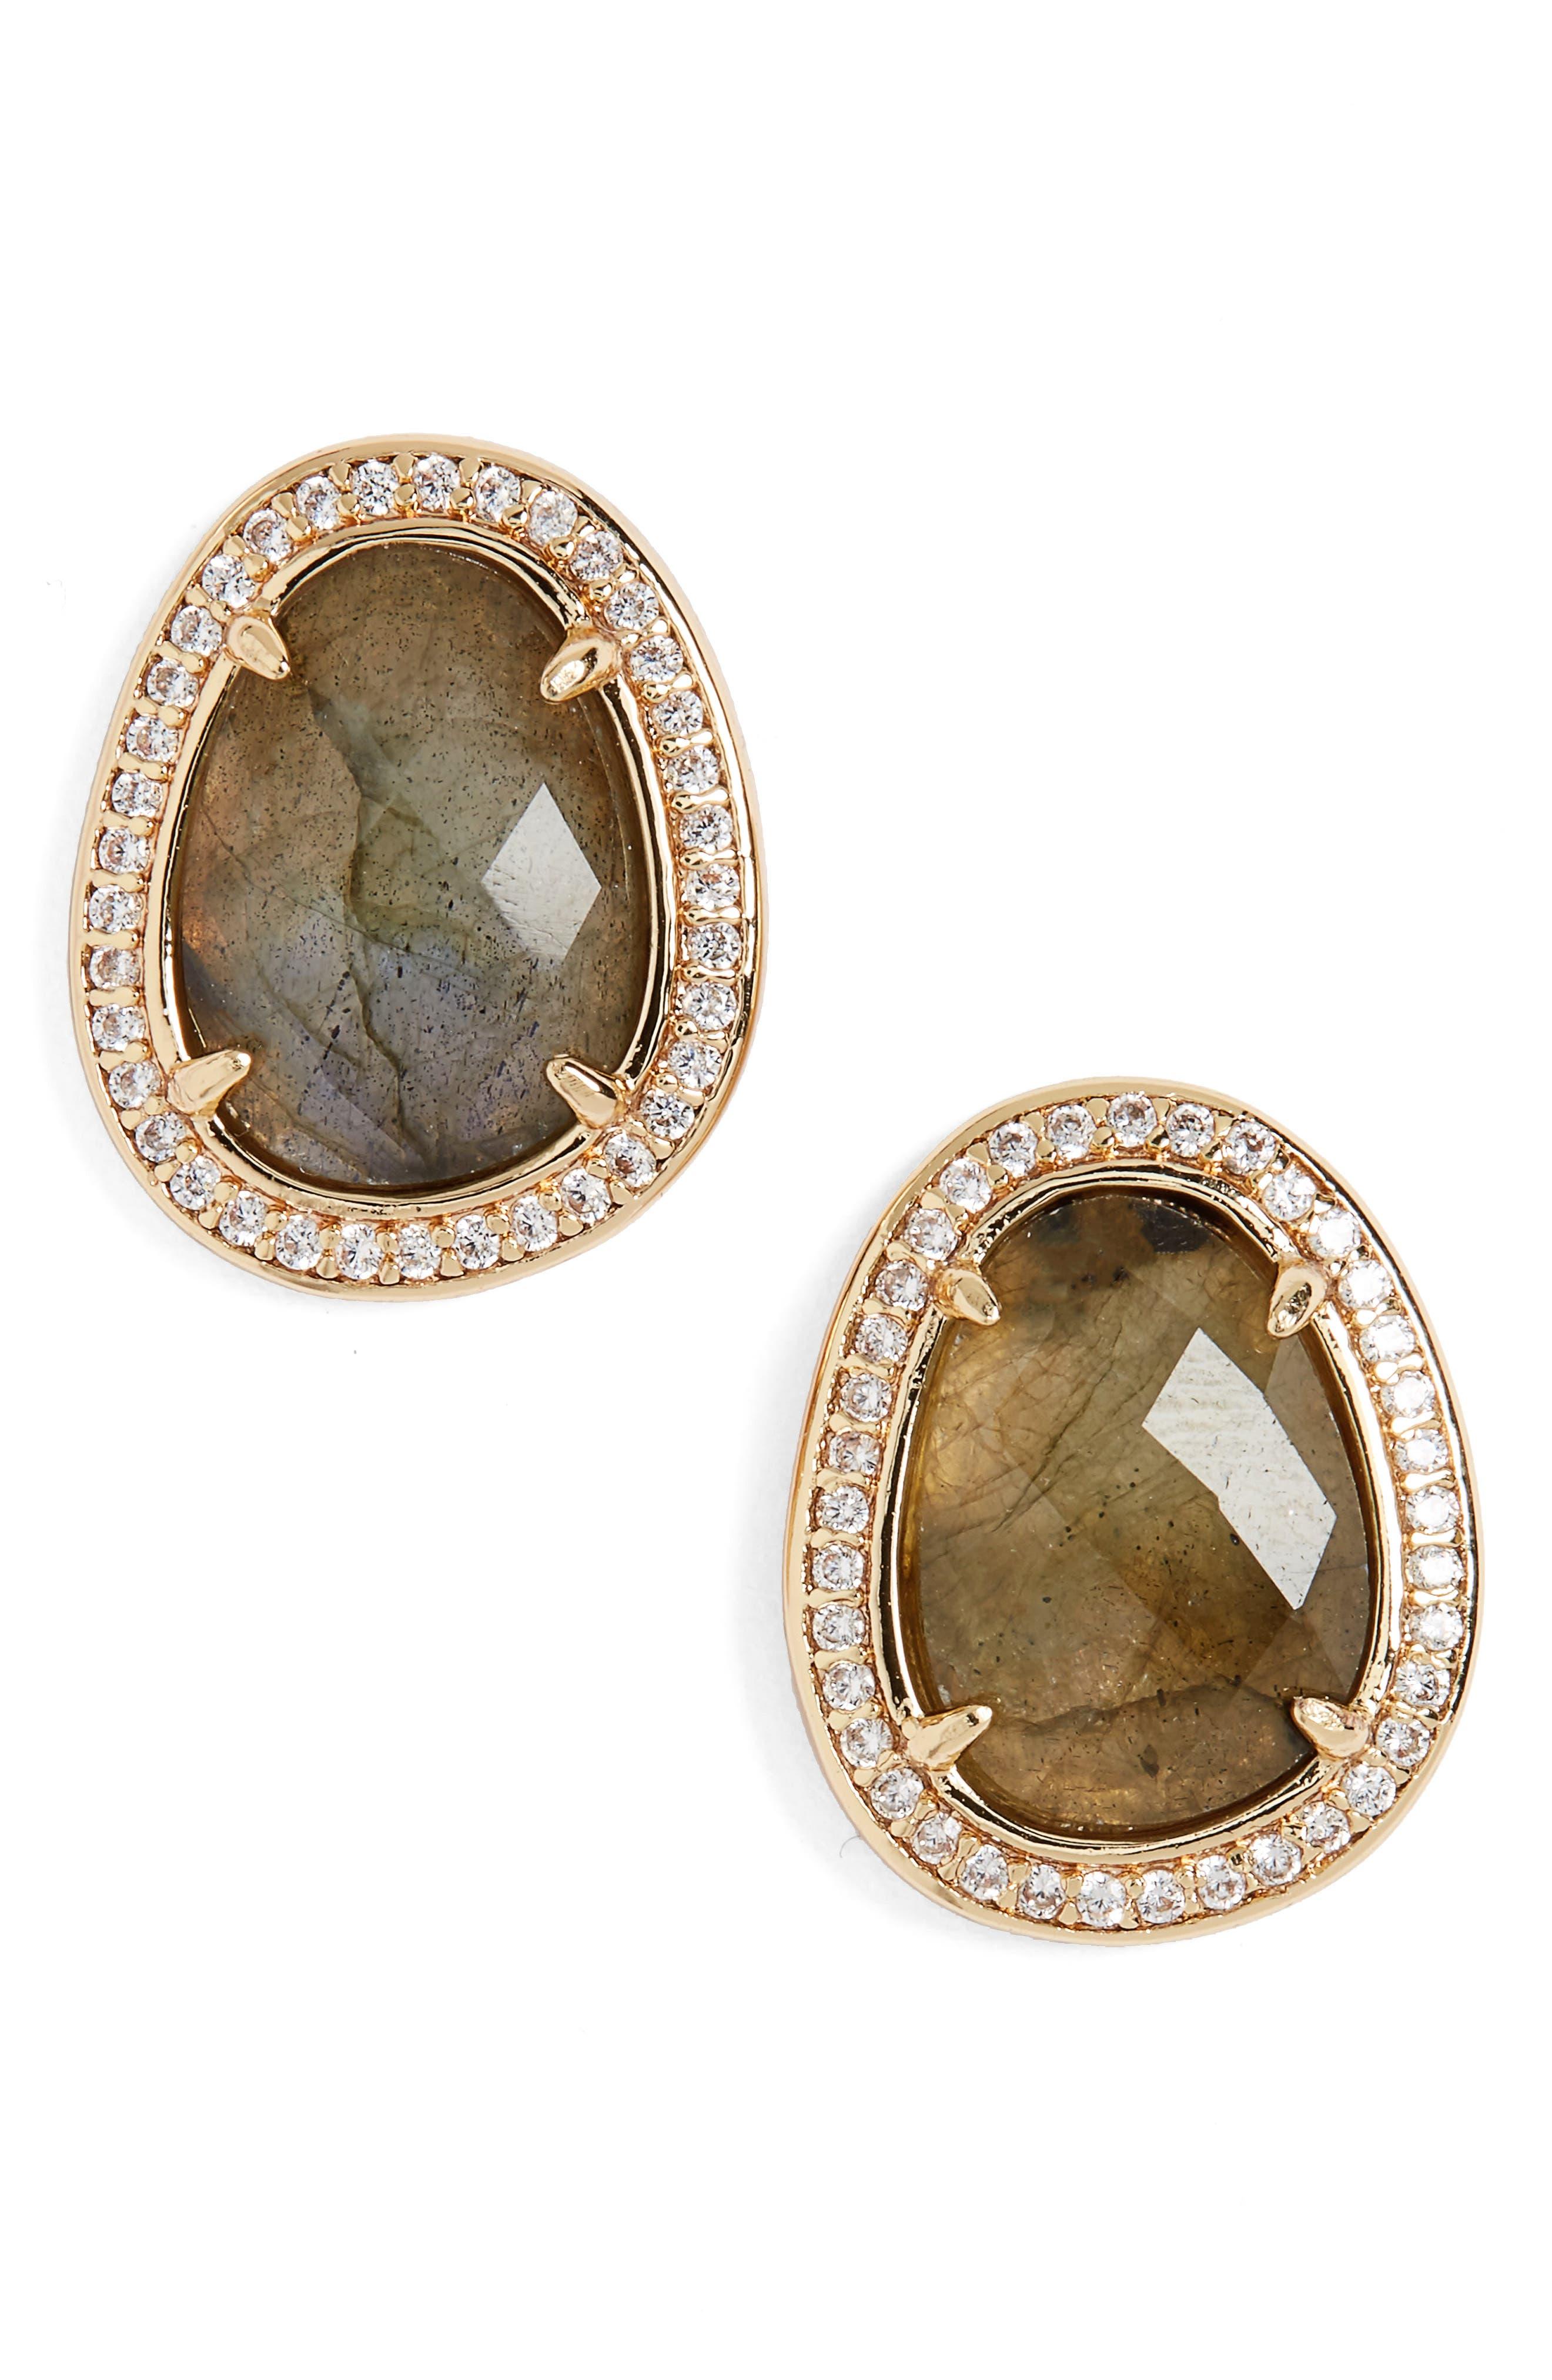 Main Image - Melanie Auld Semiprecious Stone Stud Earrings